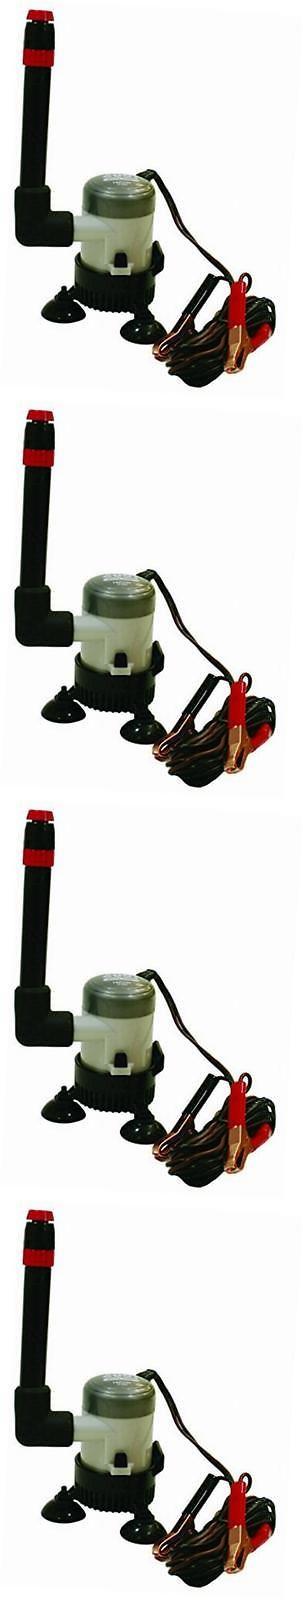 Bait Buckets 179986: Fisherman Live Bait Aerator -> BUY IT NOW ONLY: $33.86 on eBay!